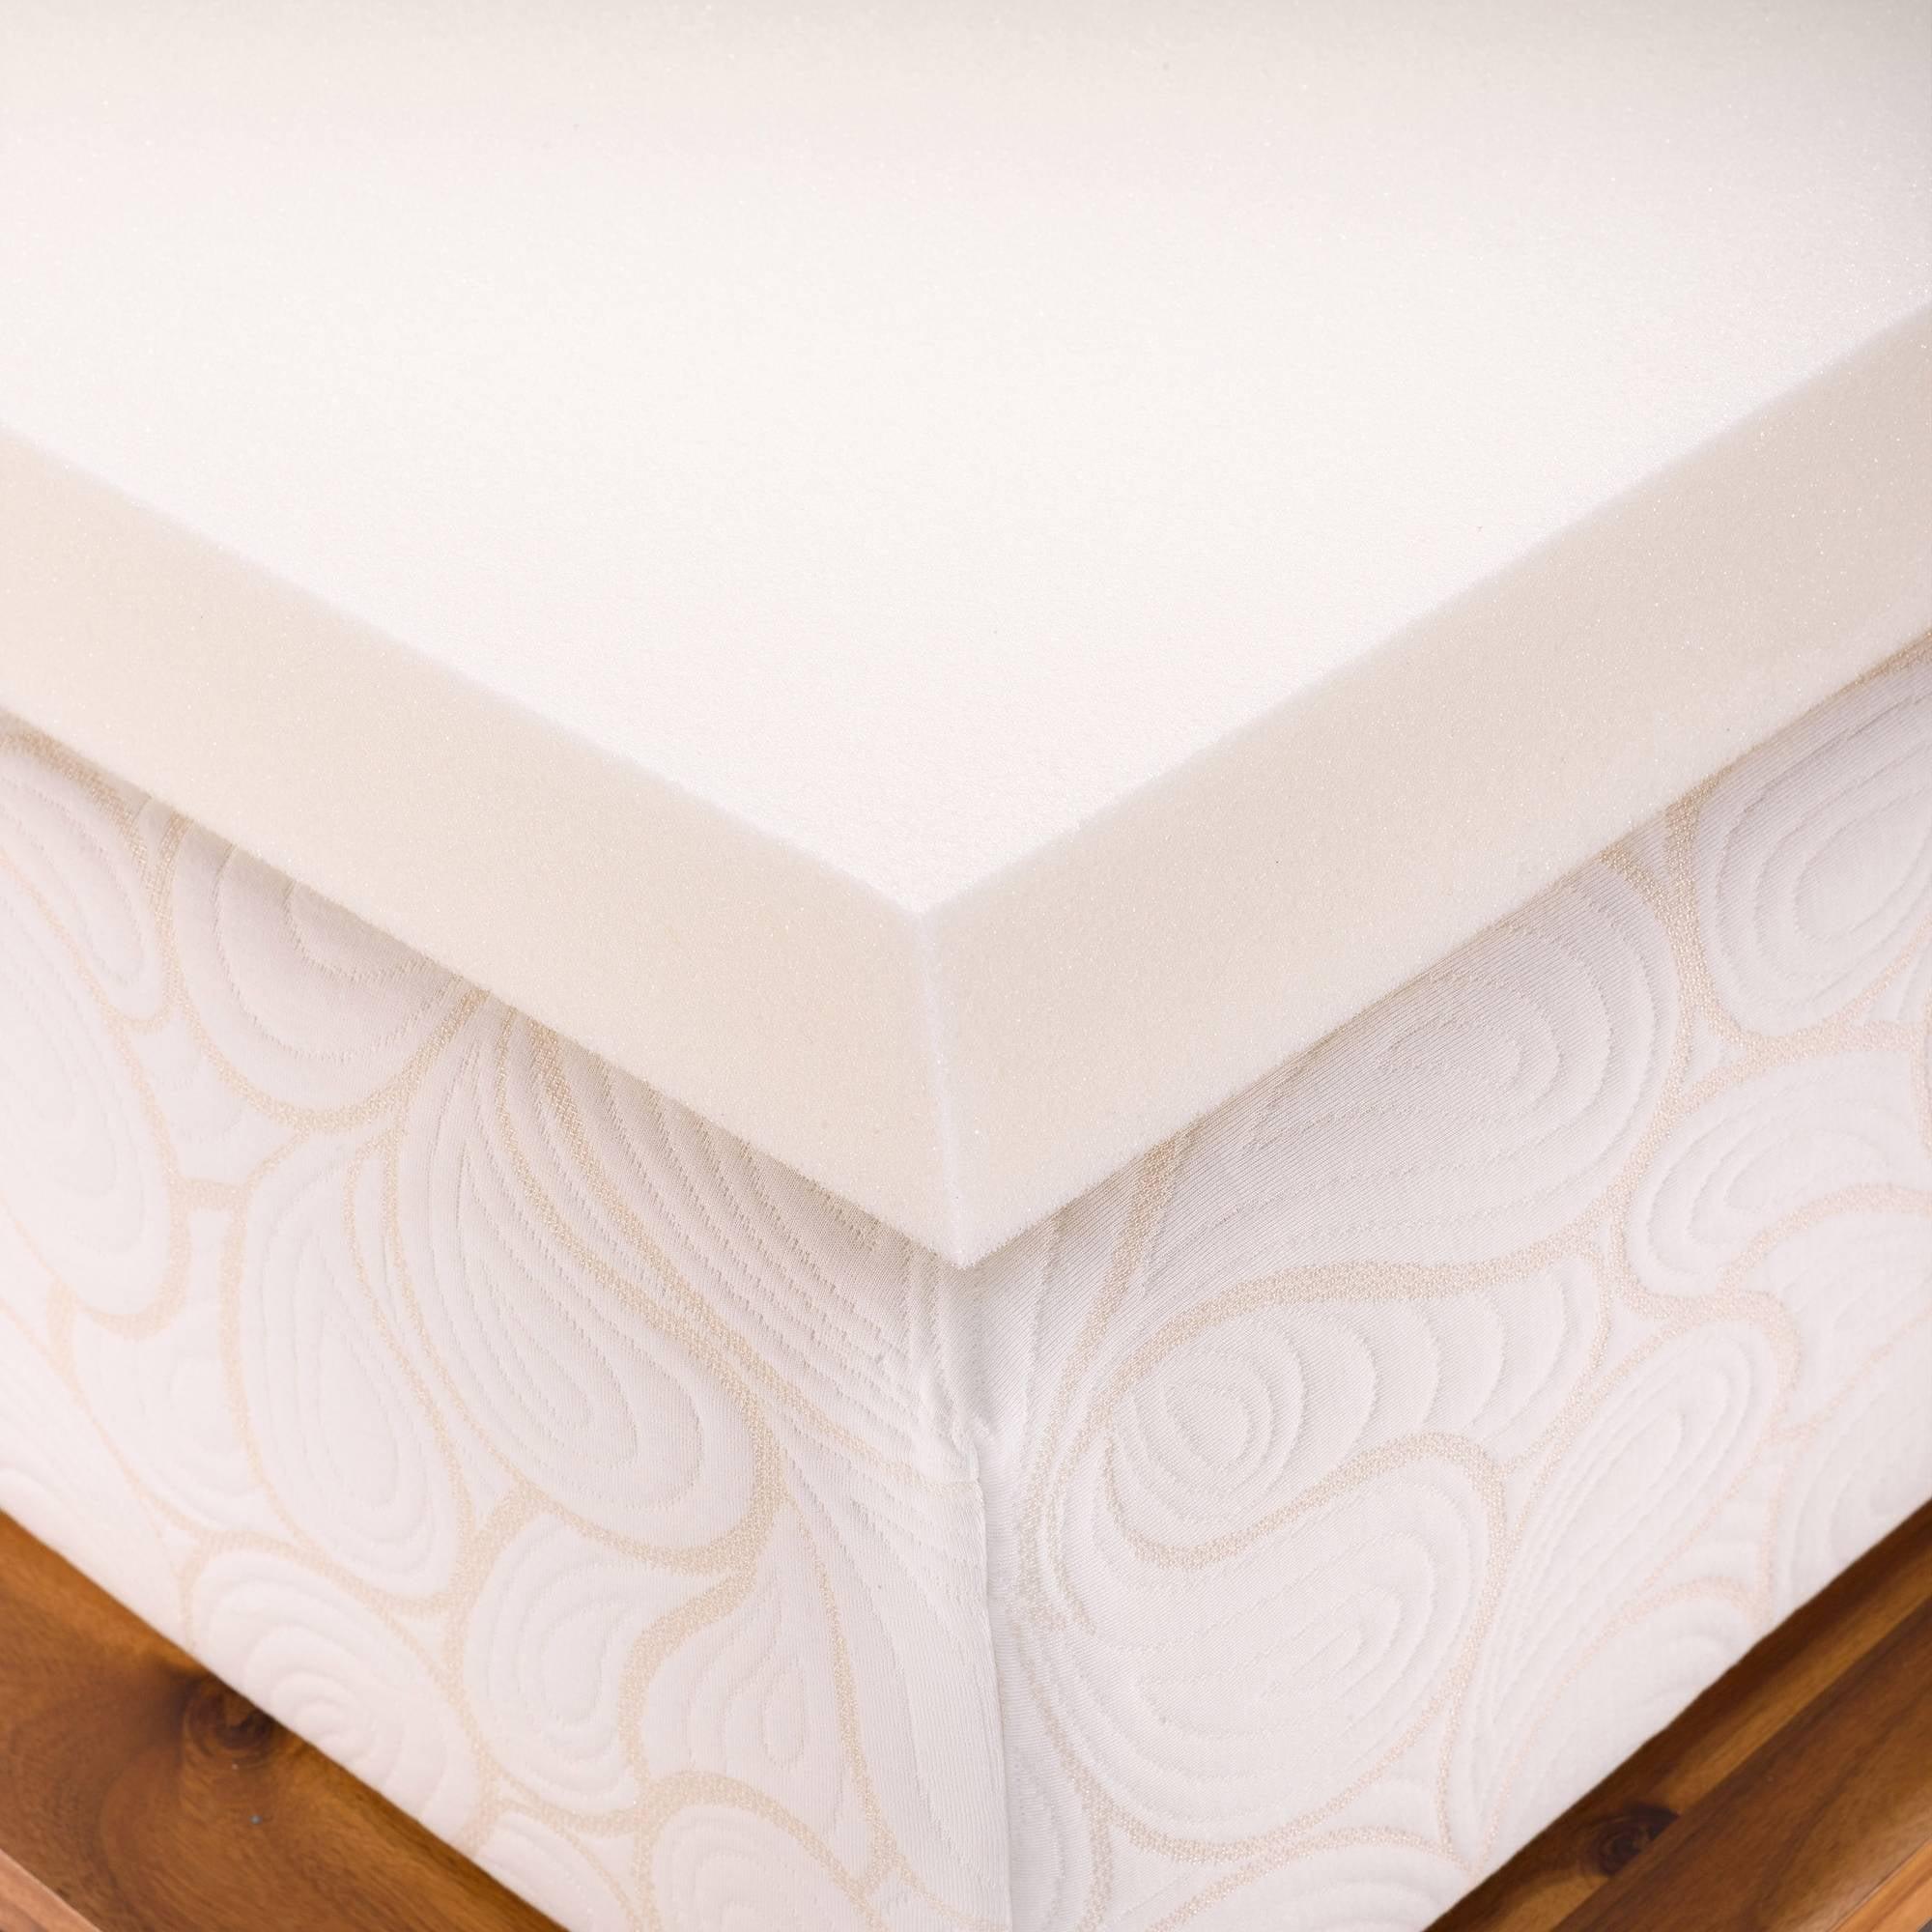 Authentic fort Memory Foam Mattress Topper Biofresh